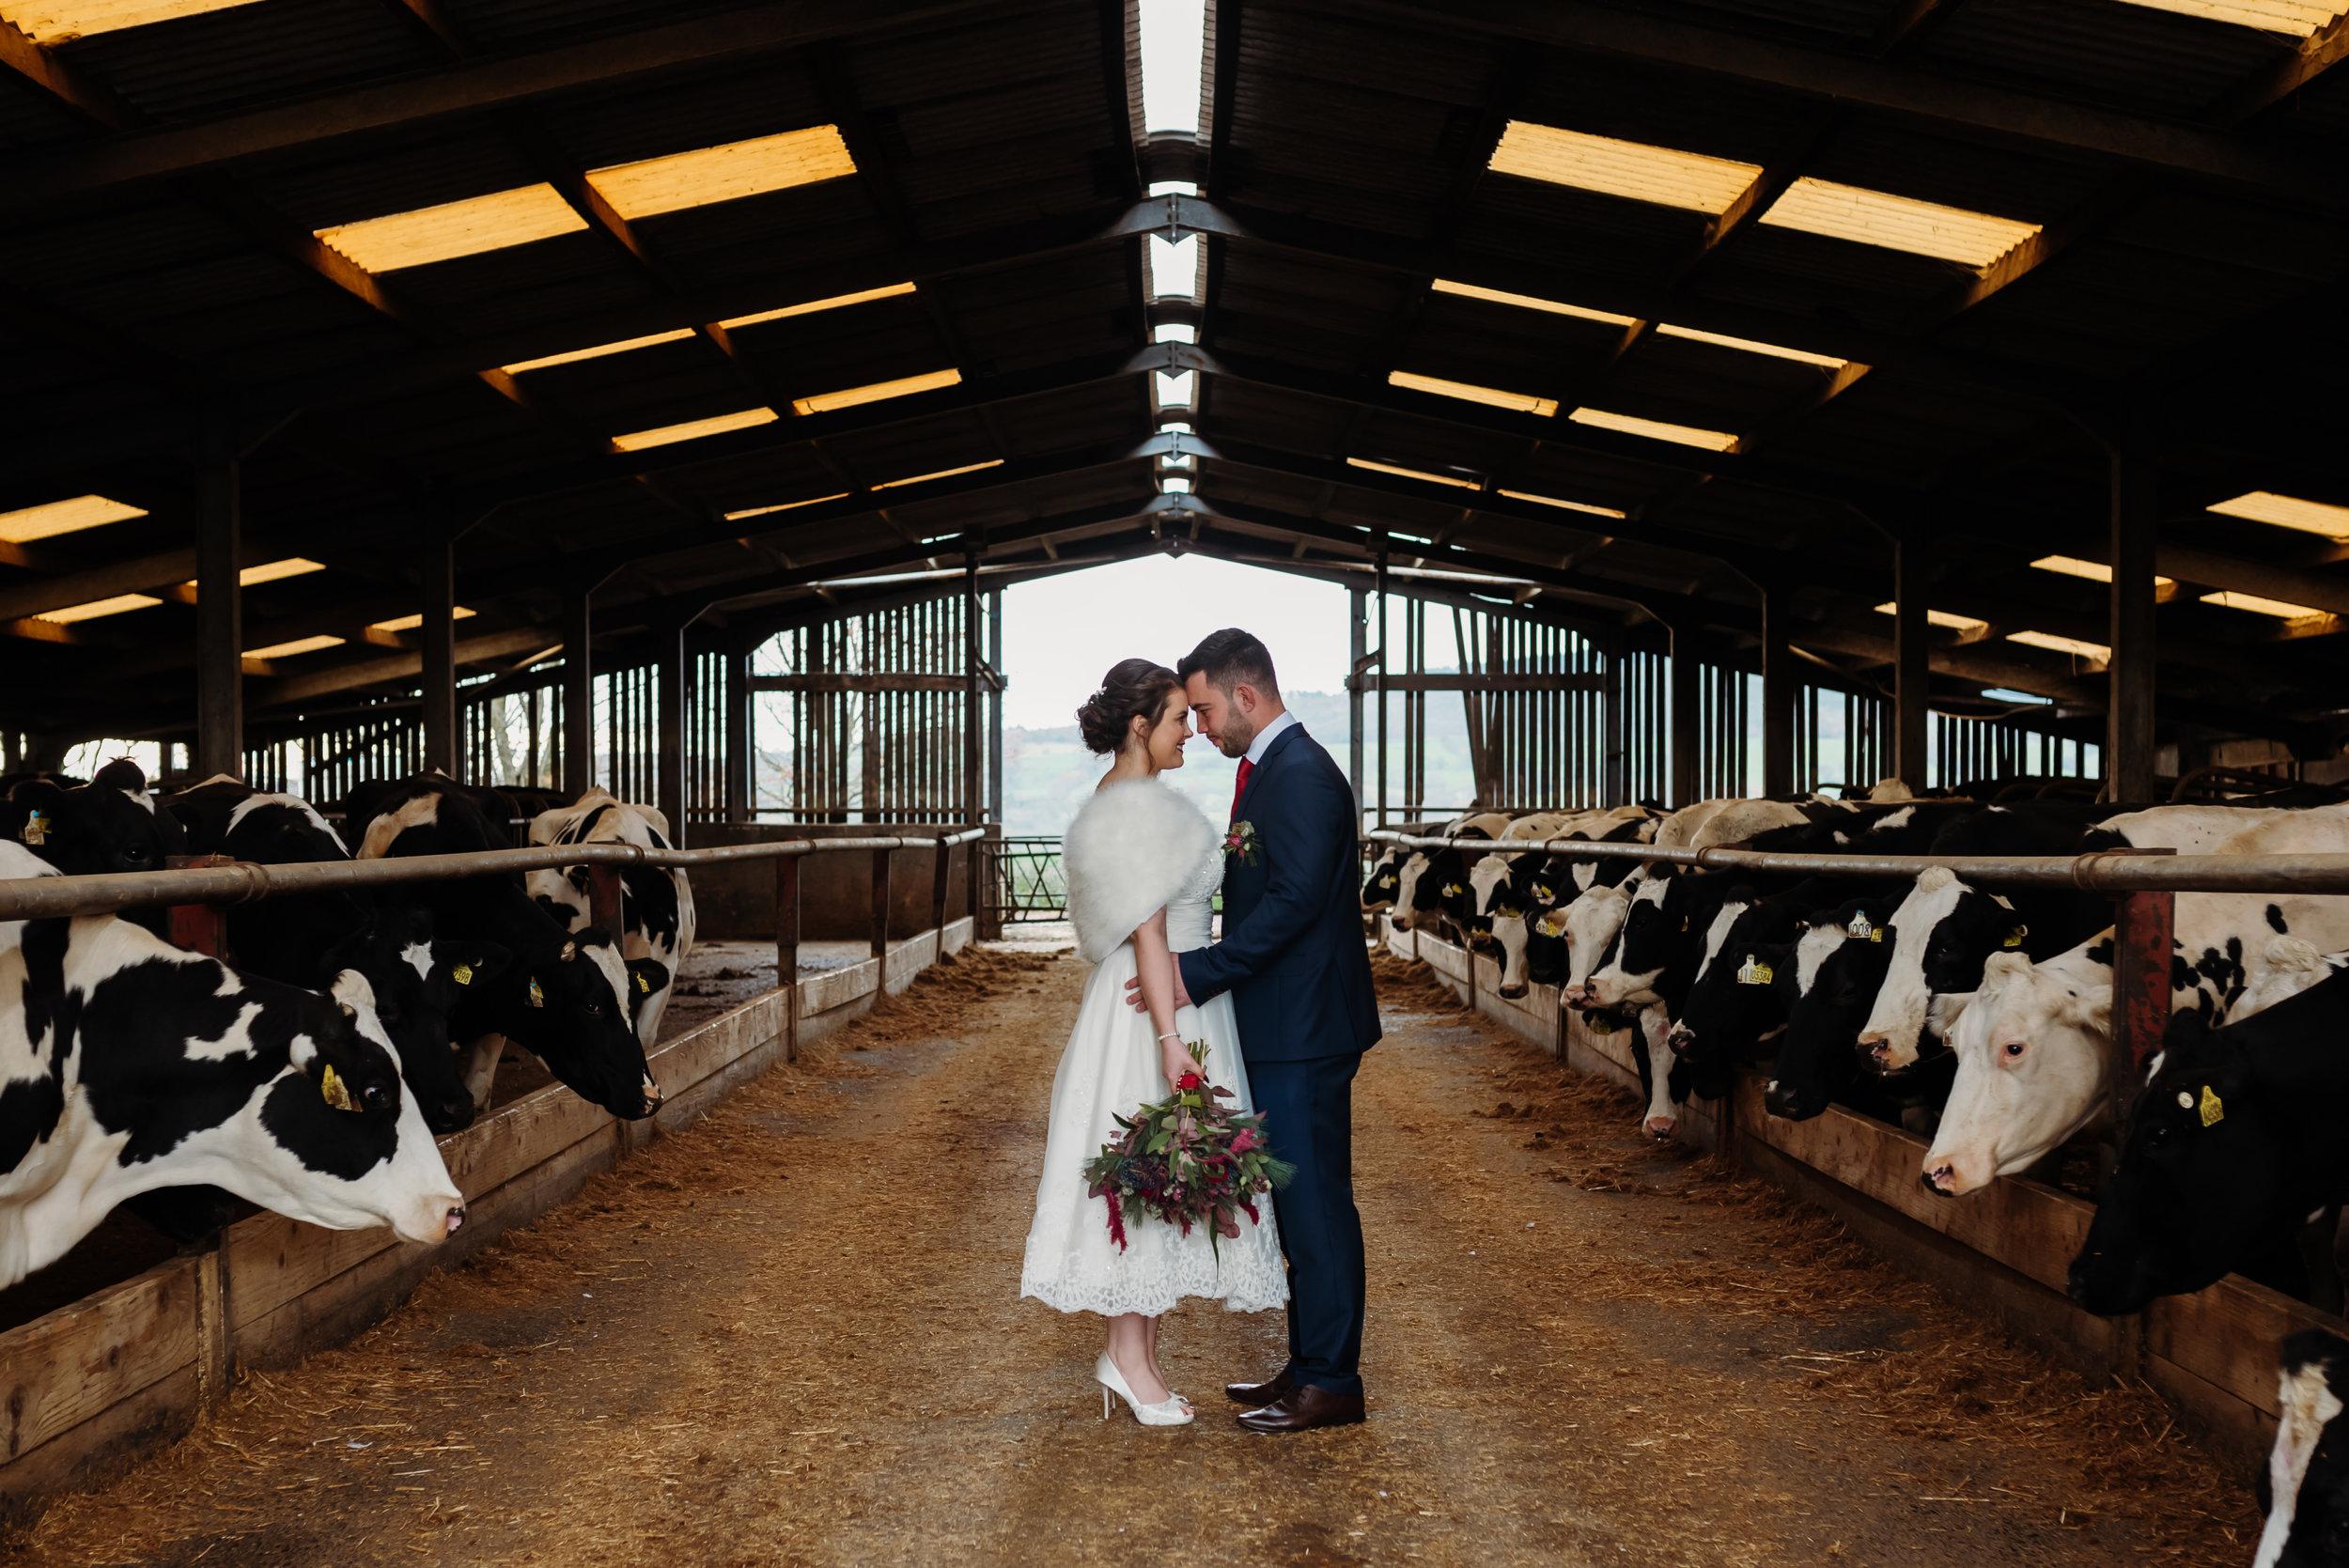 Cow shed wedding - Bashall Barn Styled Shoot